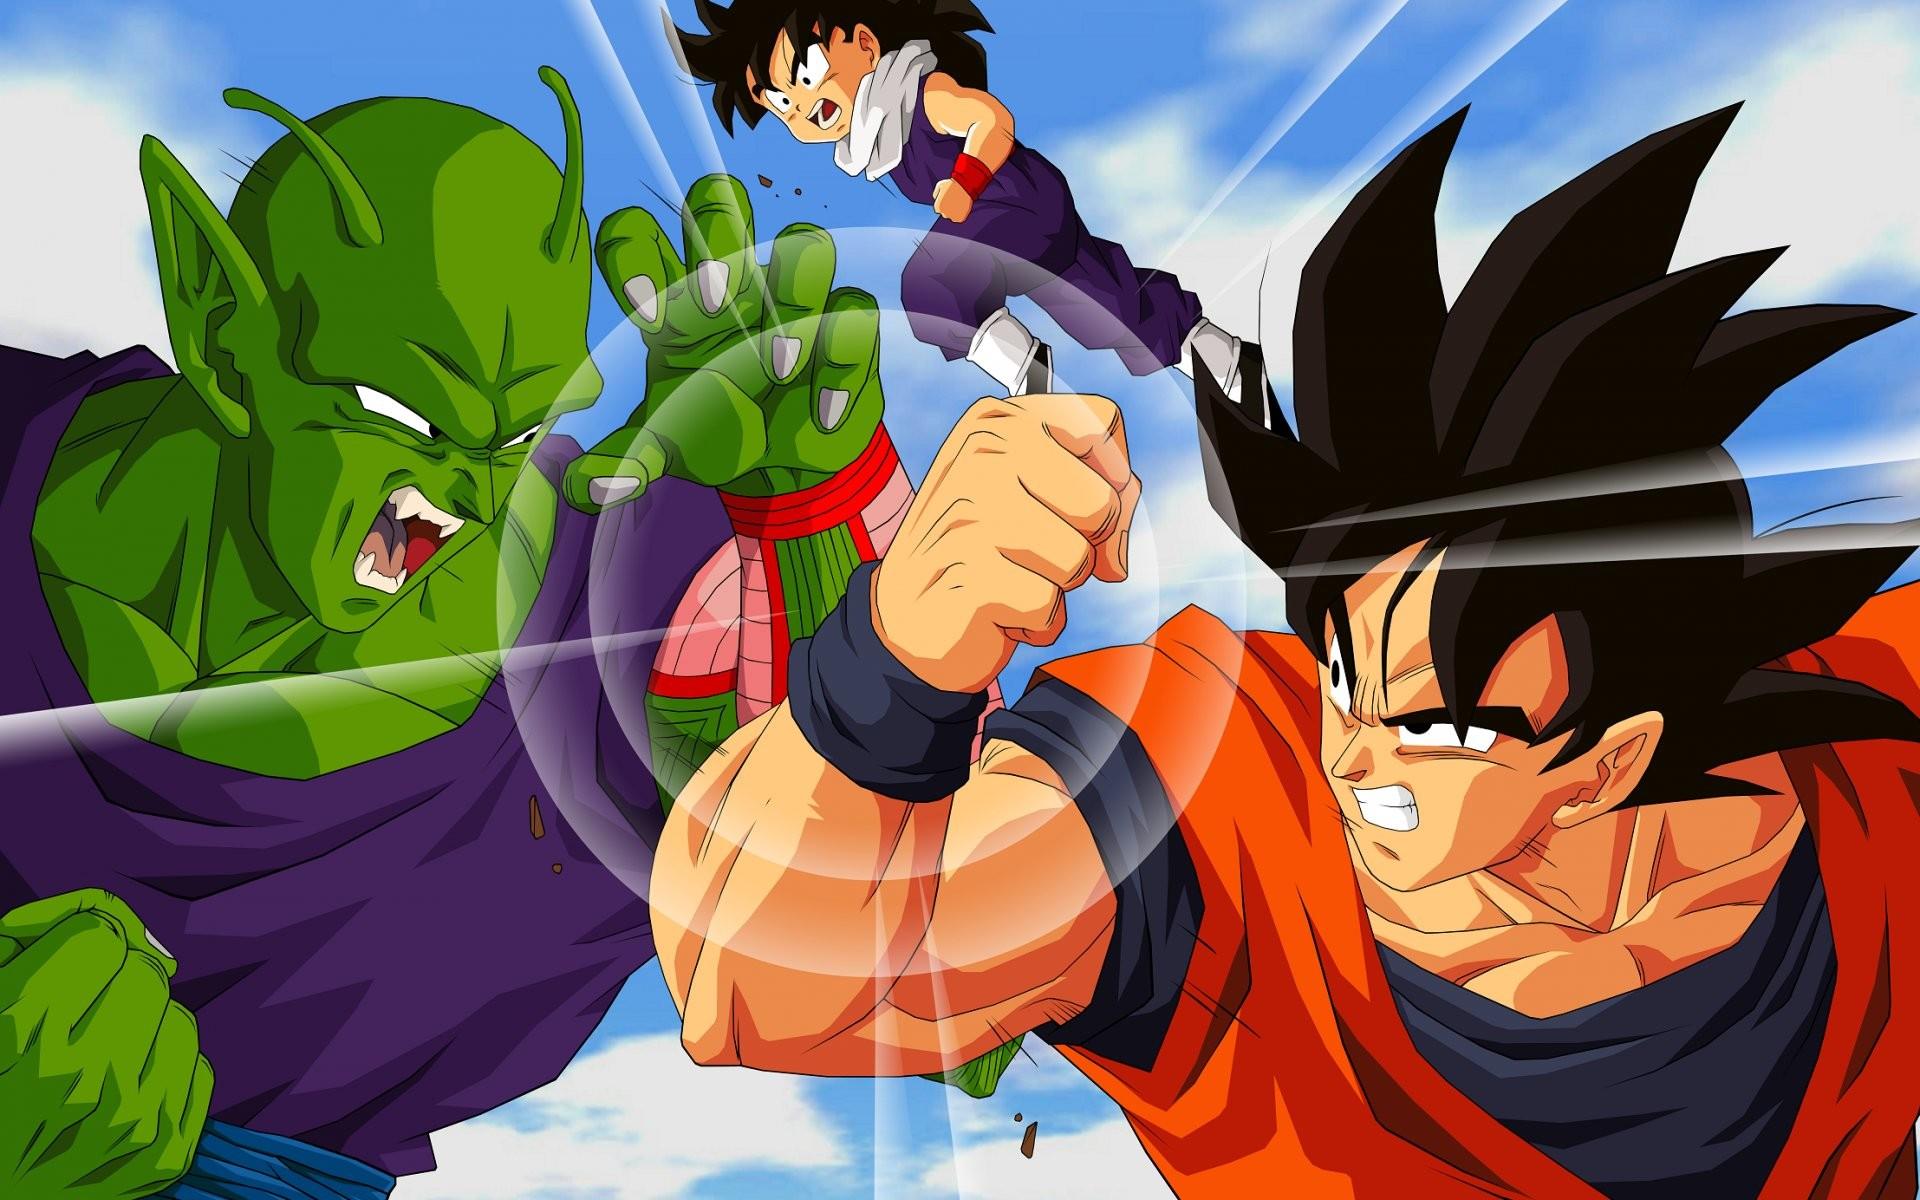 Res: 1920x1200, Goku Dragon Ball Z Photo Download Free.